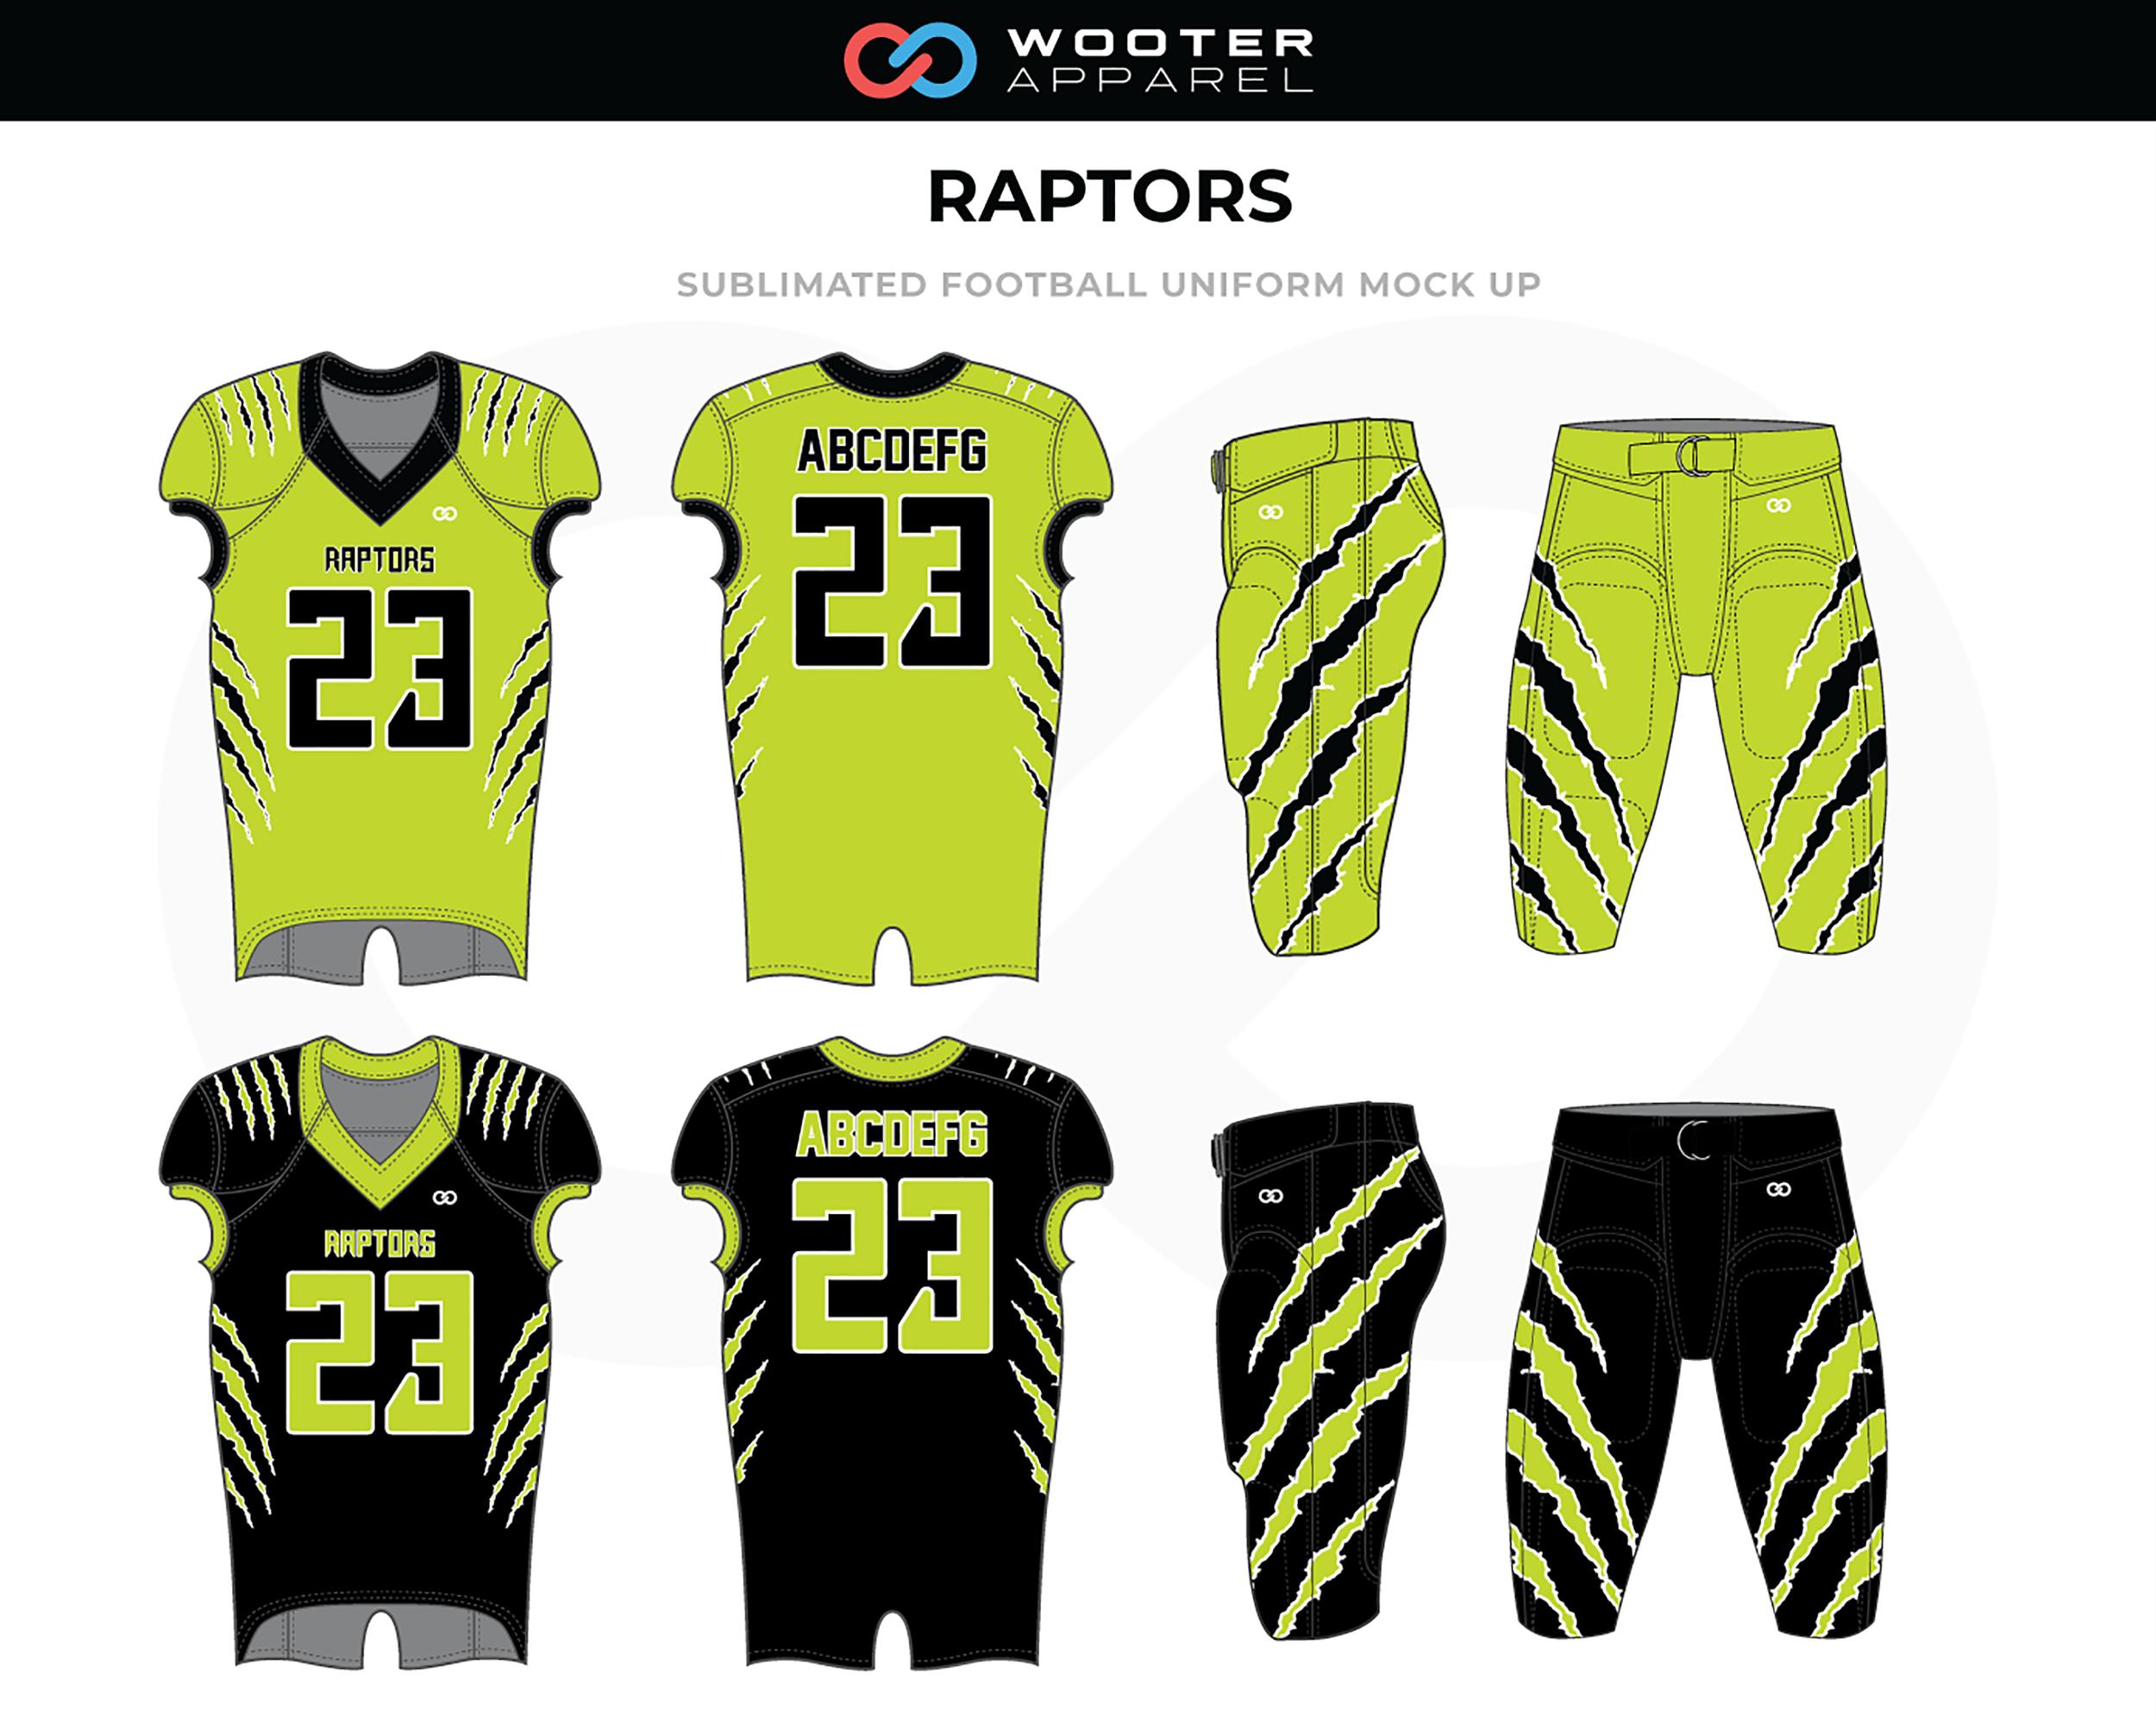 RAPTORS Neon Green Black Football Uniforms, Jerseys, and Pants